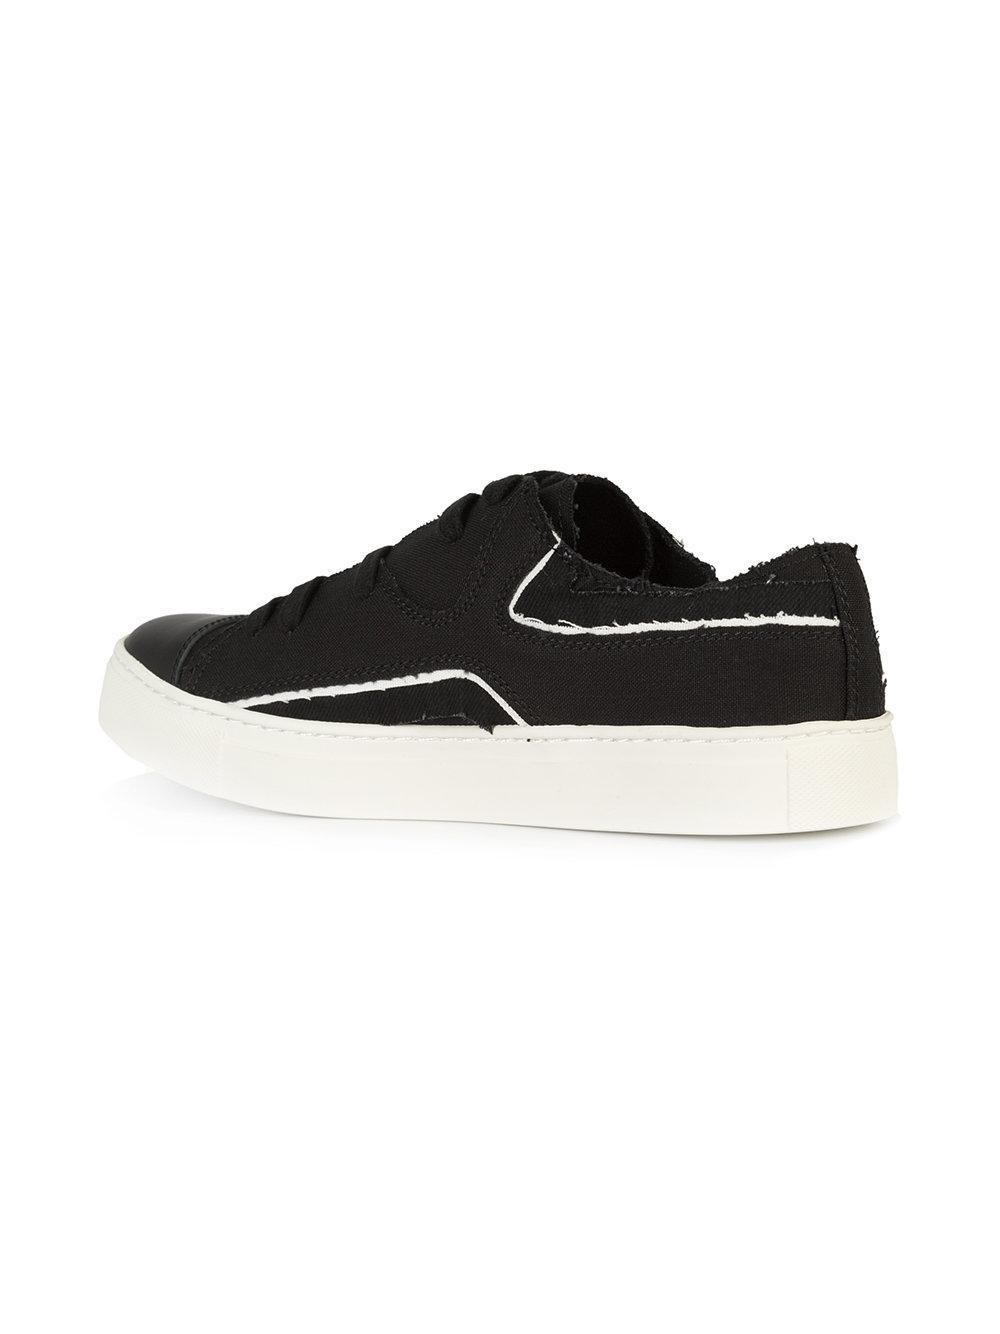 584e6be162dae Yohji Yamamoto - Black Sneakers - Lyst. View fullscreen